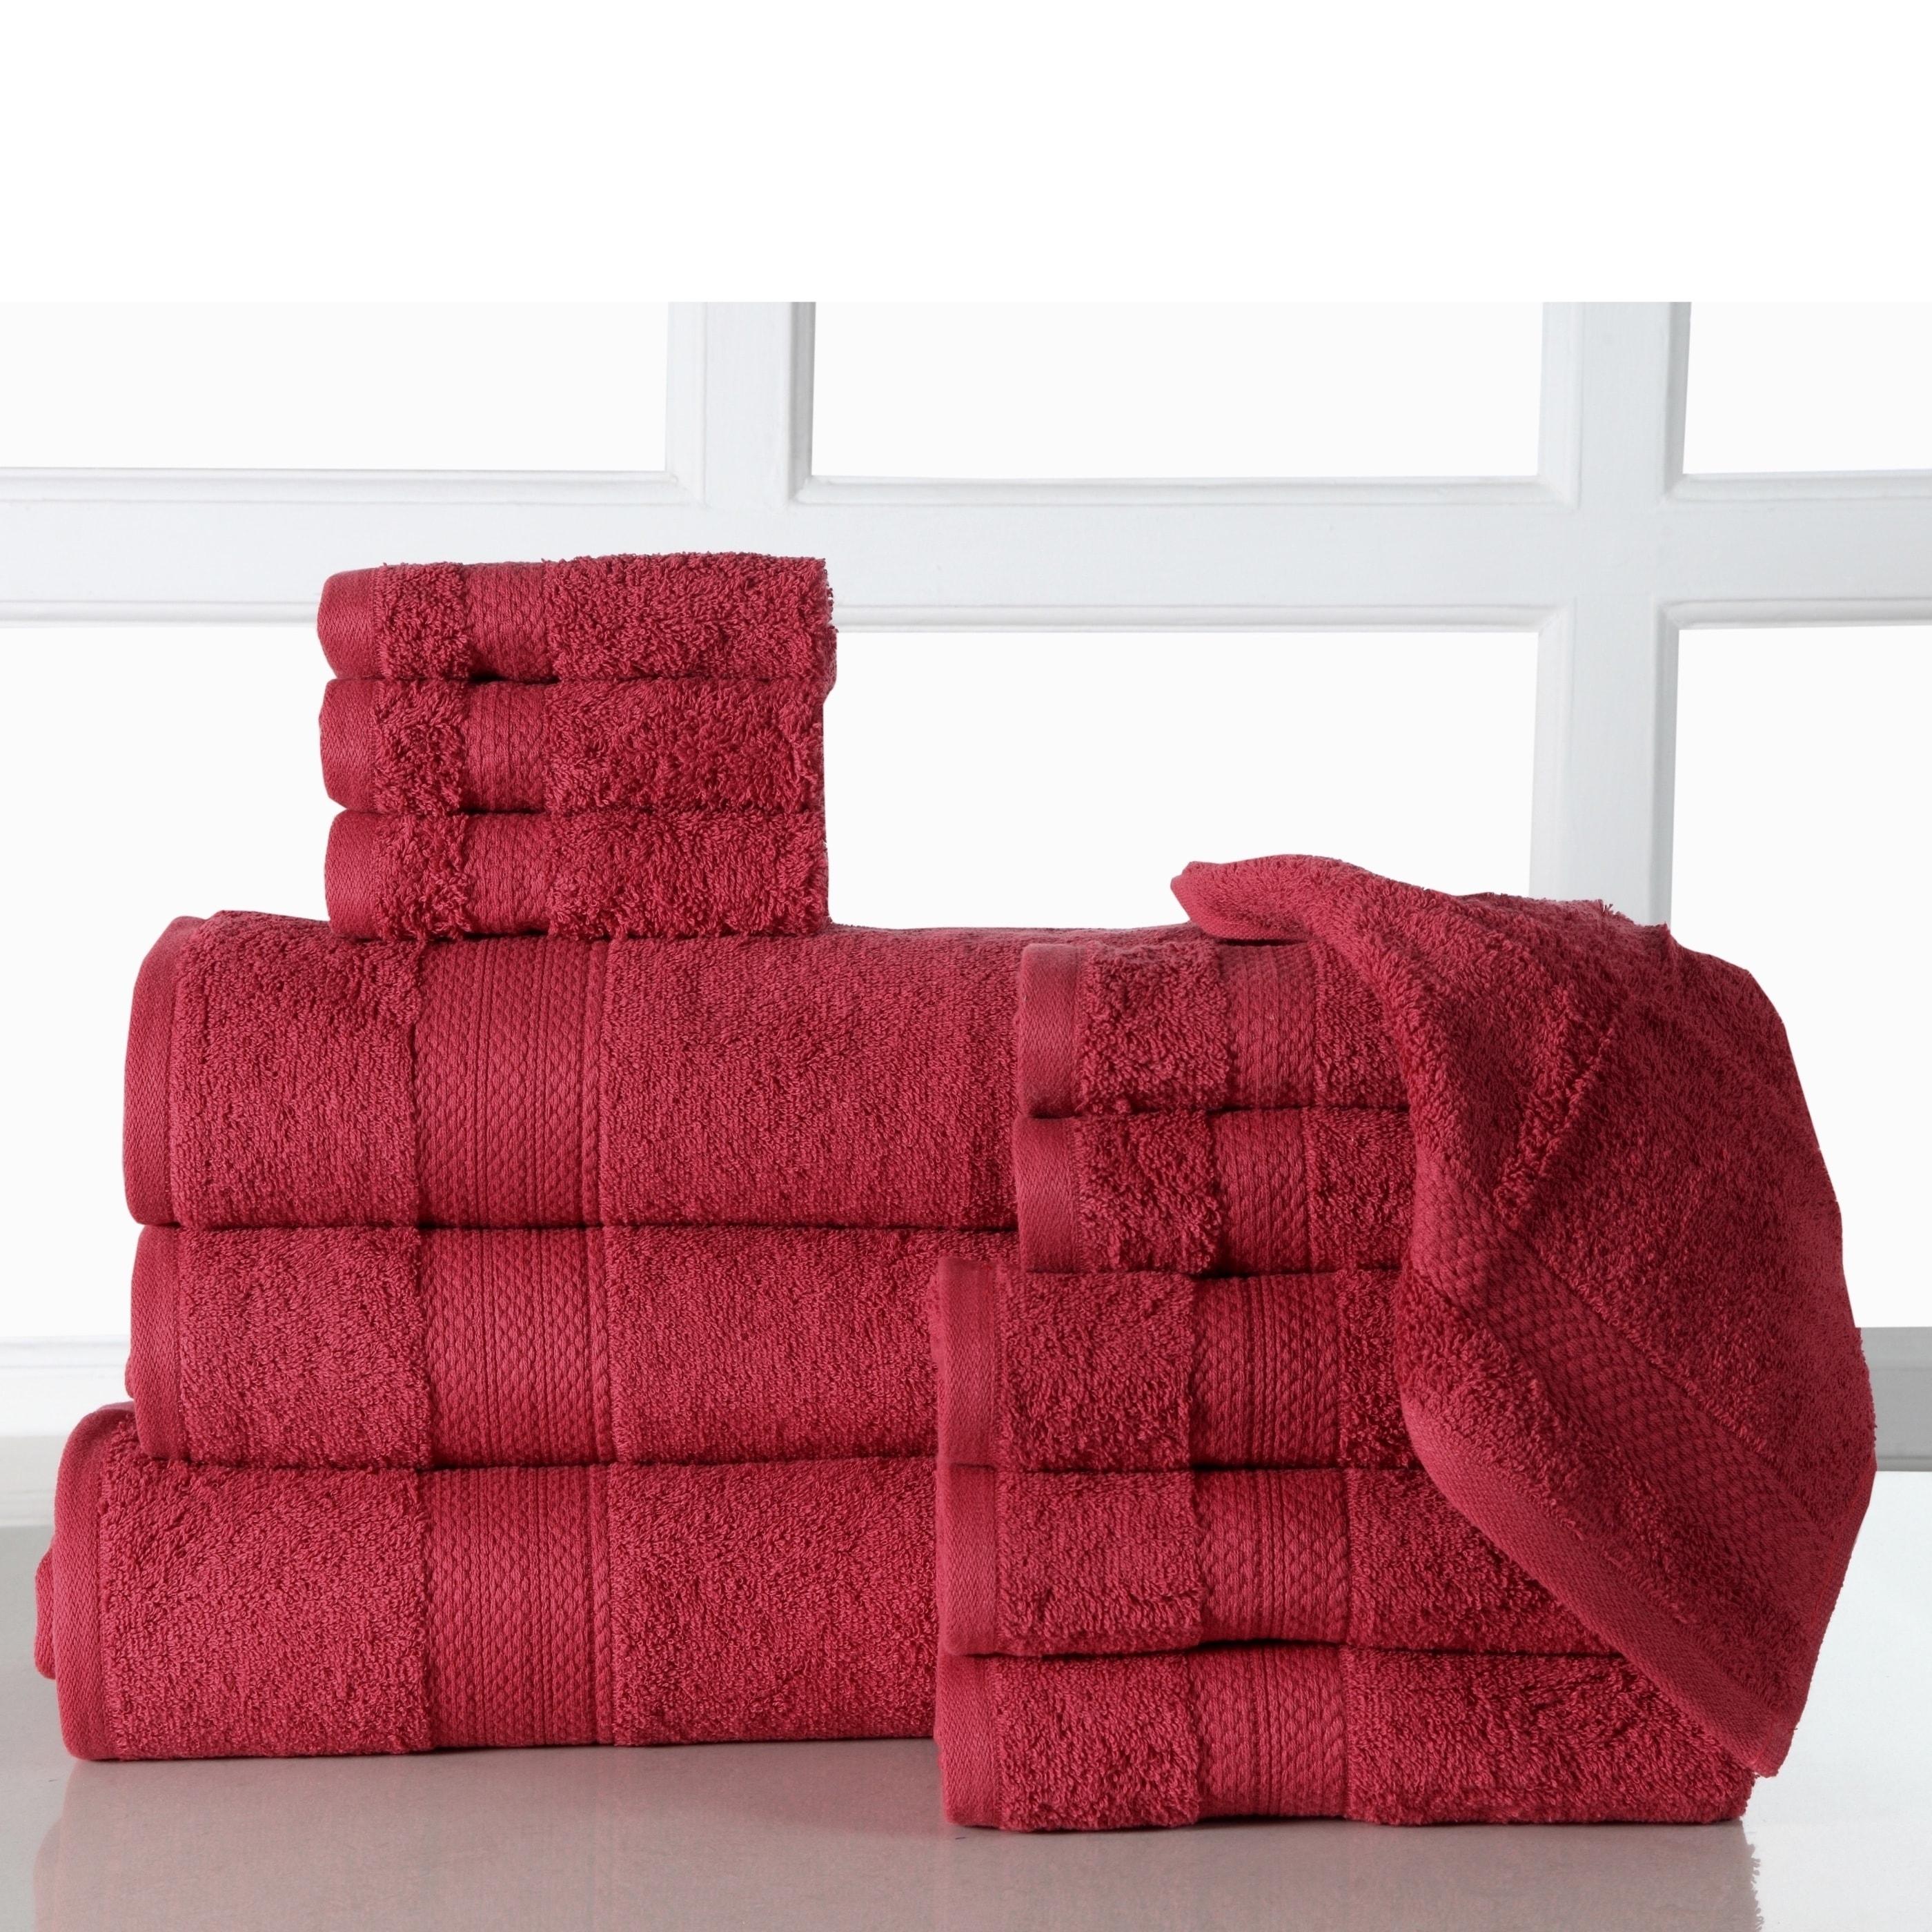 Cotton Super Soft Towels Hand Bath Plaid Checks Towel Sheet US Stock 2019